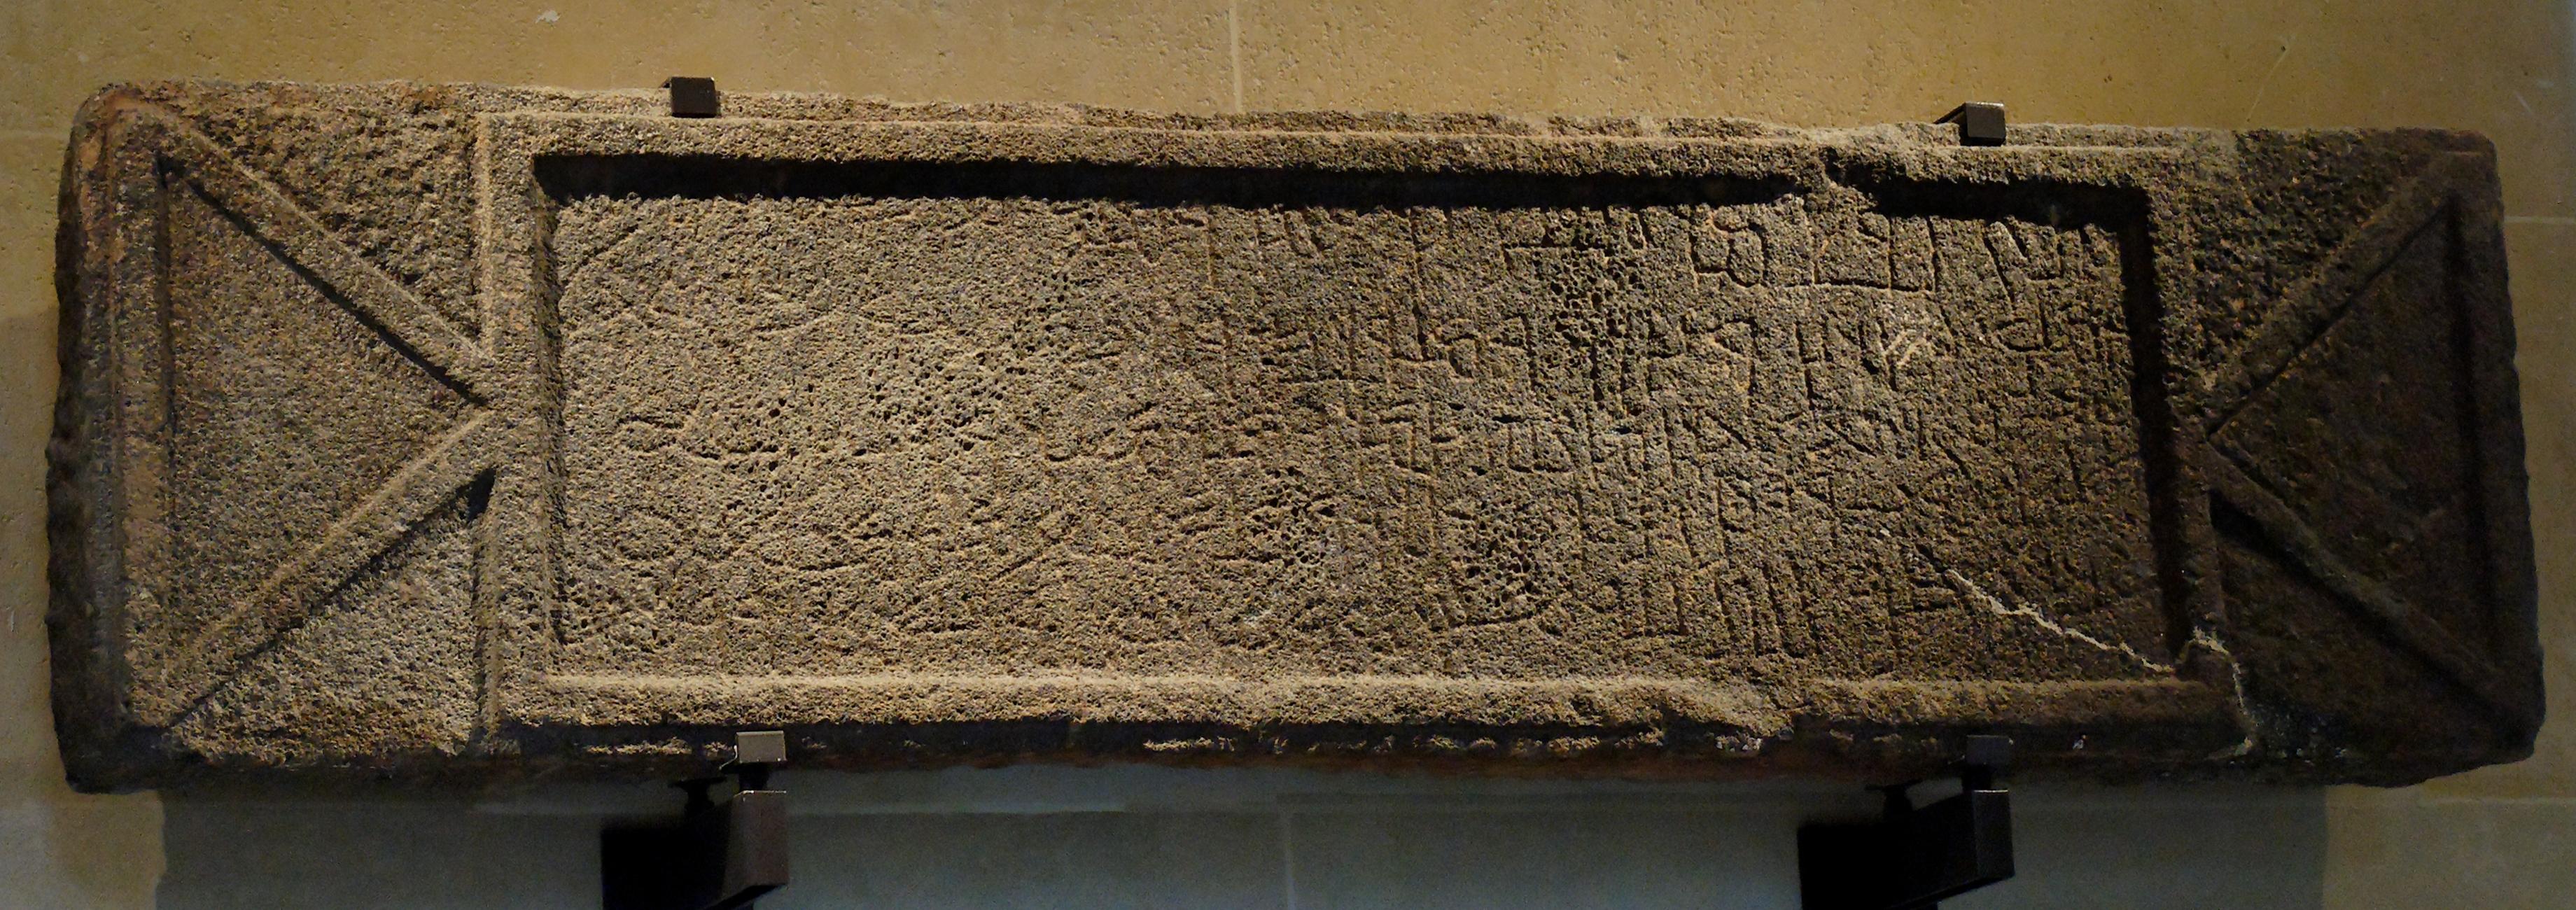 http://upload.wikimedia.org/wikipedia/commons/9/97/Epitaph_Imru-l-Qays_Louvre_AO4083.jpg